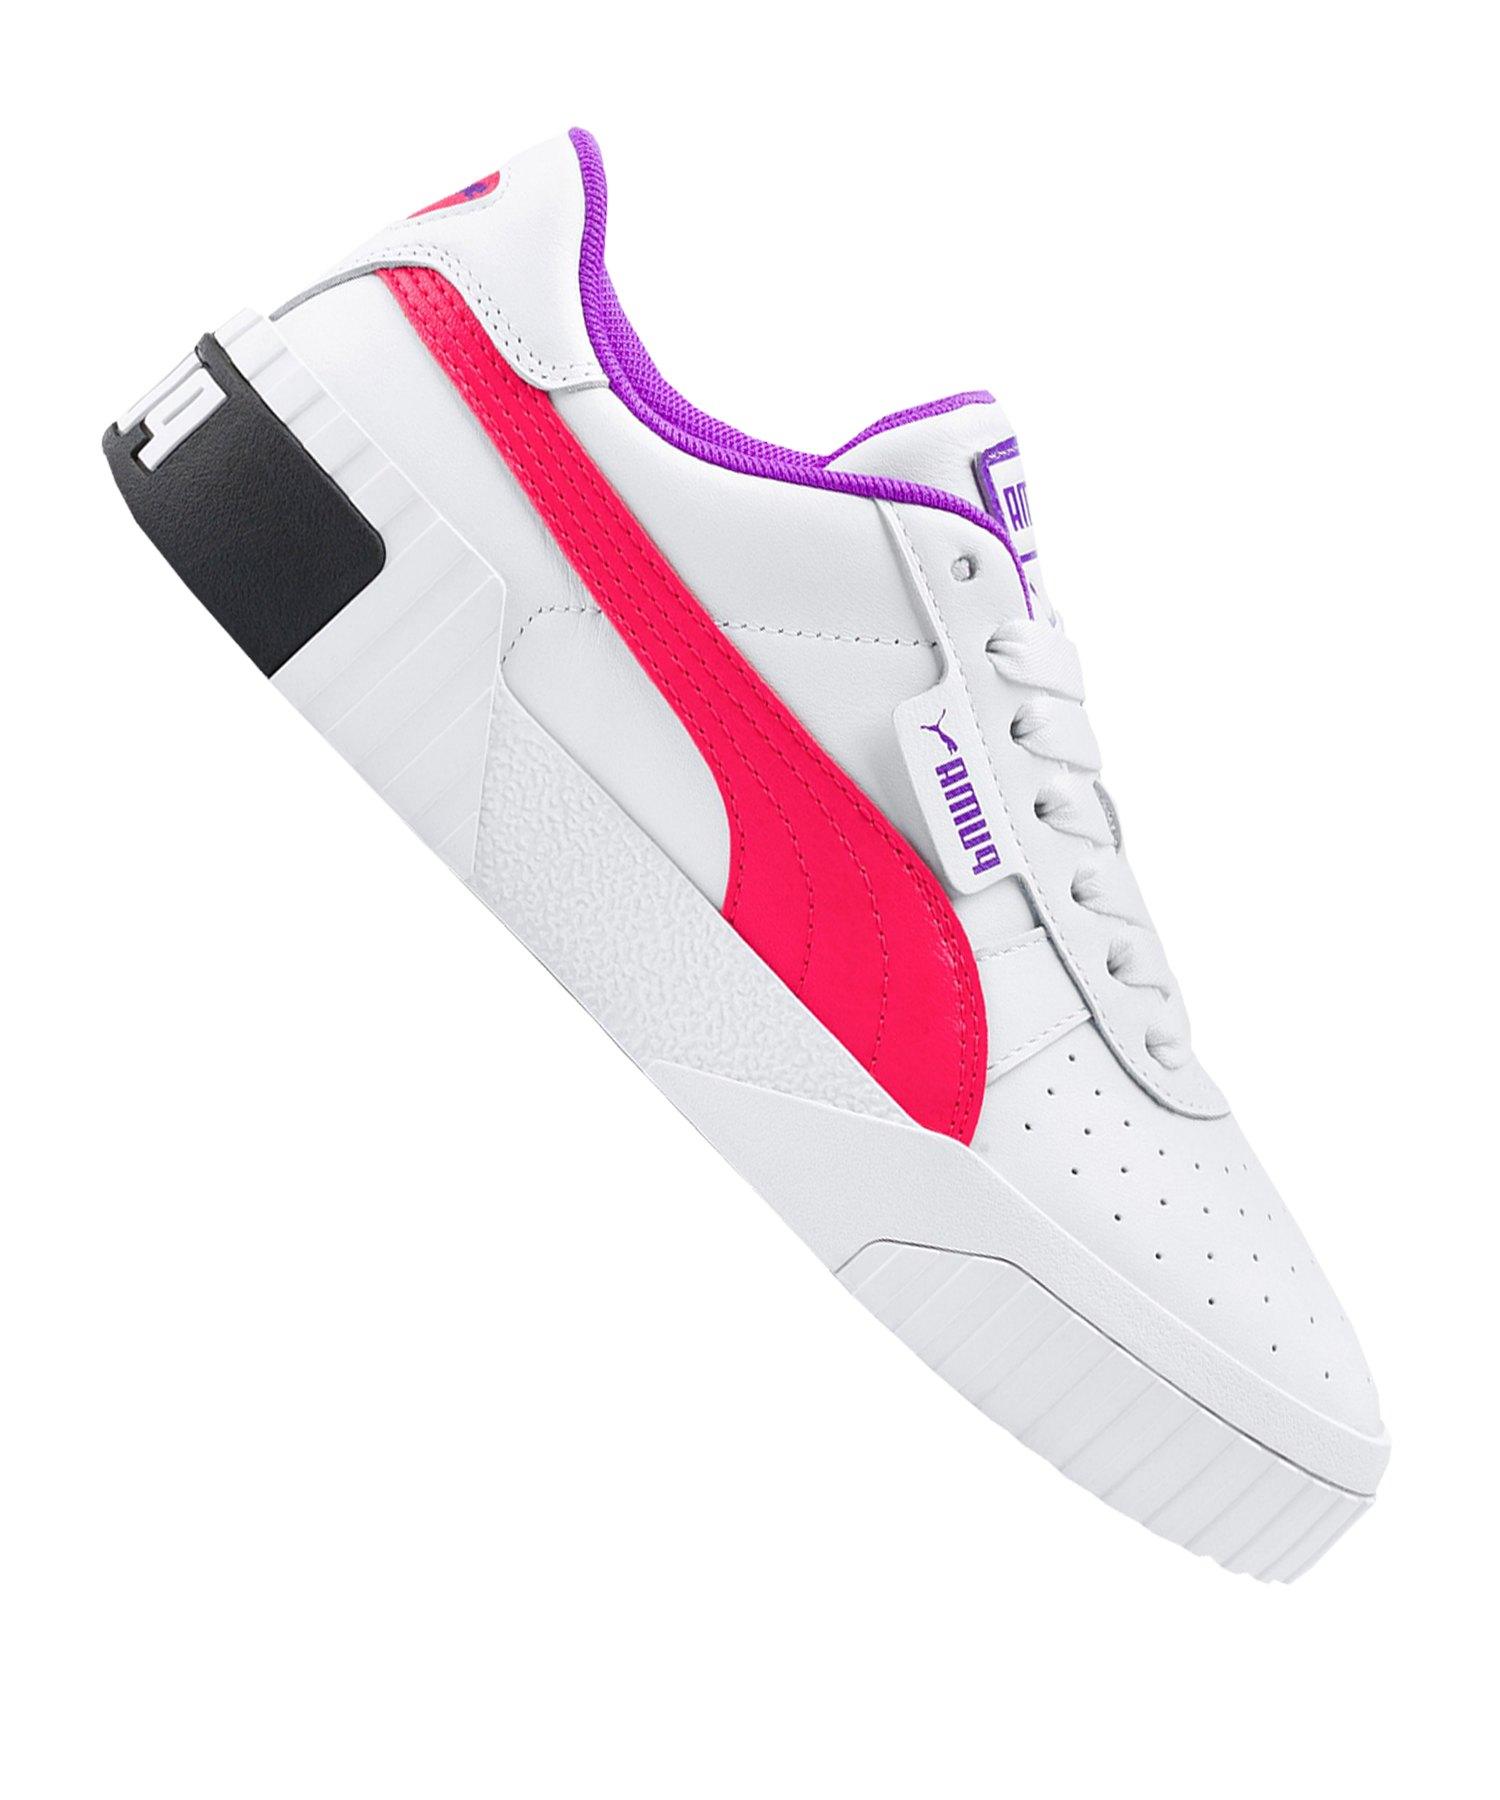 Sneaker Puma Cali F05 Damen Schwarz 76bfgy